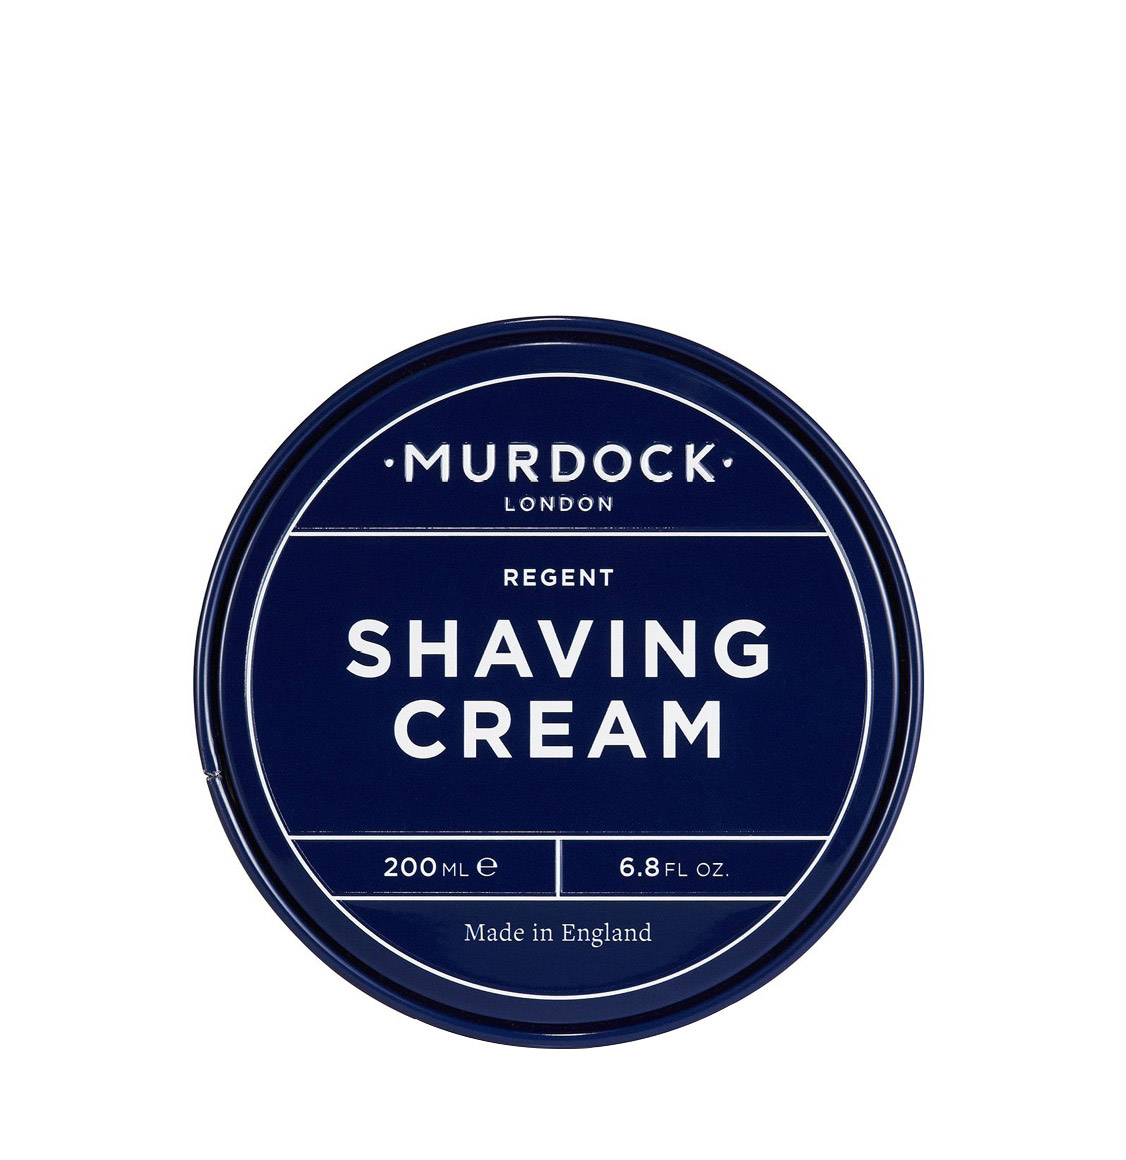 Murdock London Shaving Cream 200ml